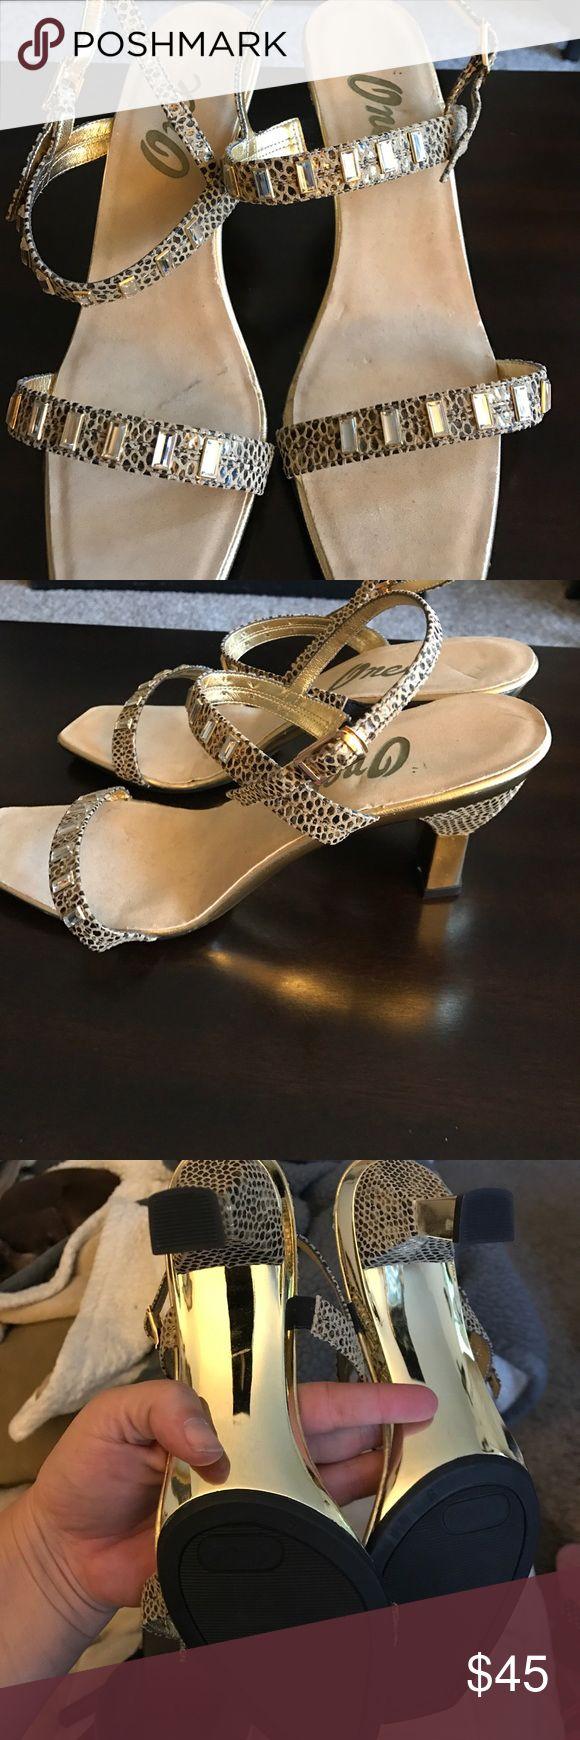 Never worn Onex heels Never worn Onex heels with diamond (fake) accents. Women's size 9 Onex Shoes Heels